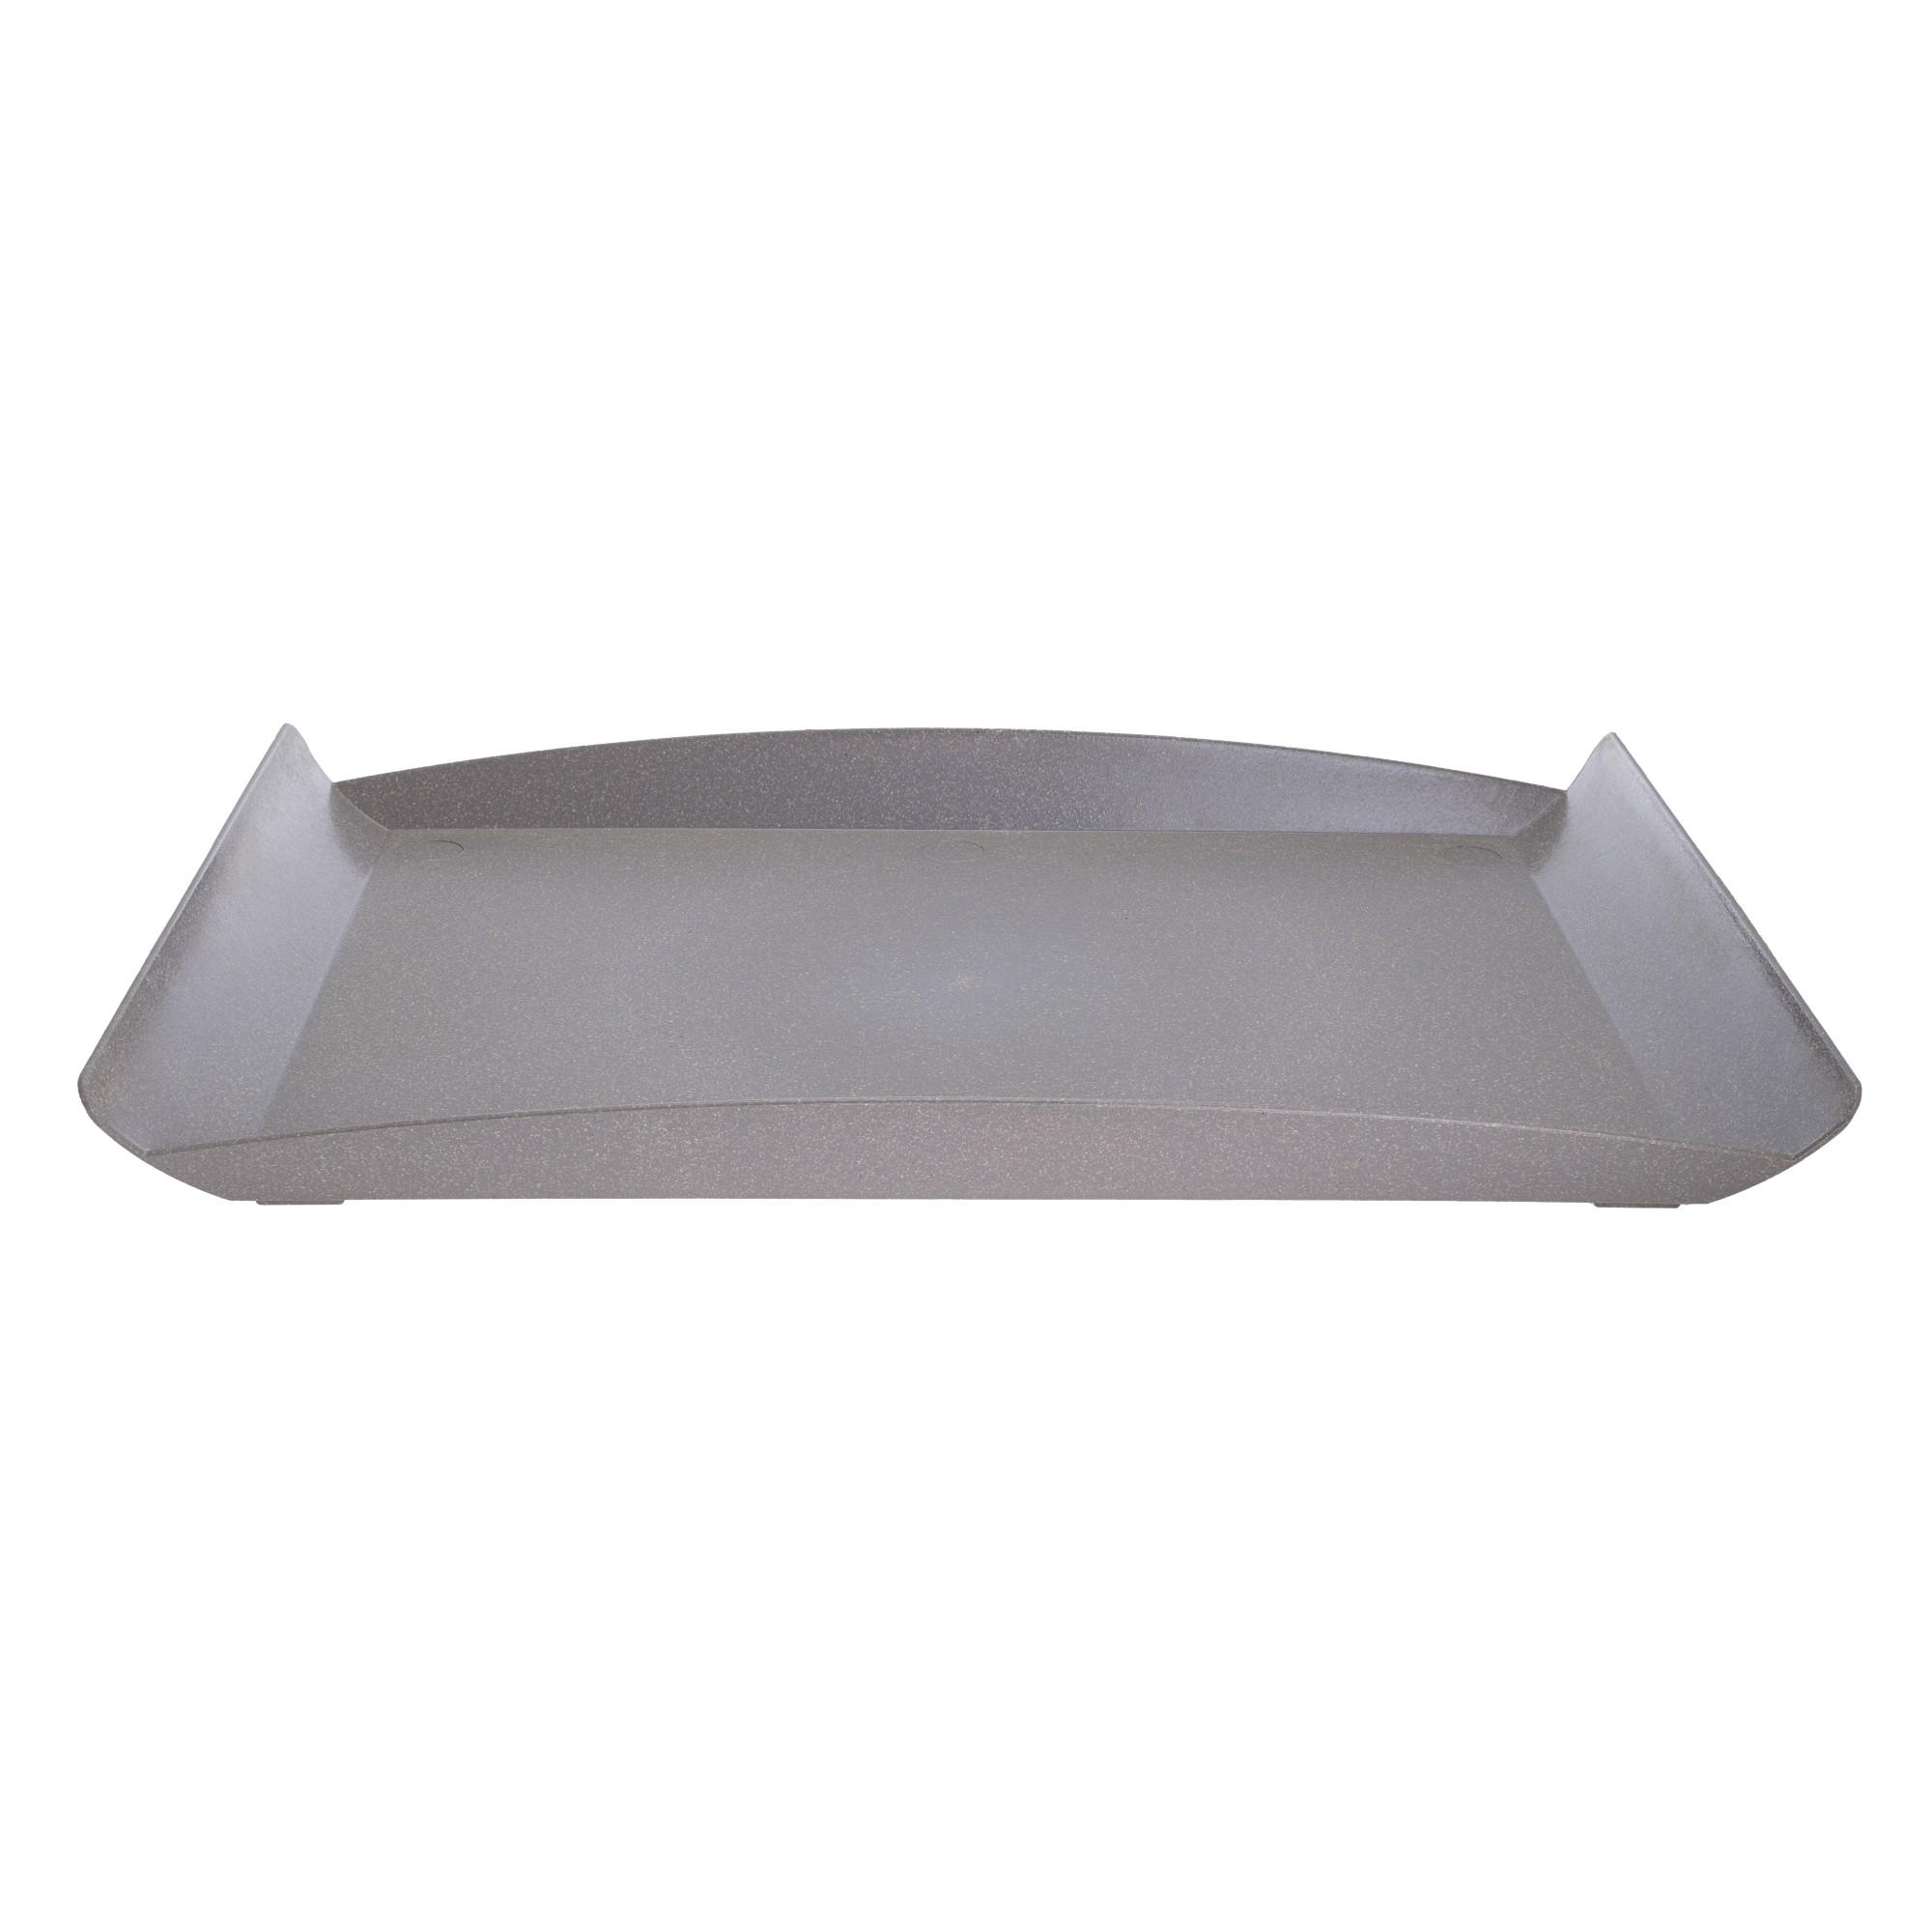 Bandeja Retangular de Plastico 30 x 43 cm Cinza 7123 - Evo